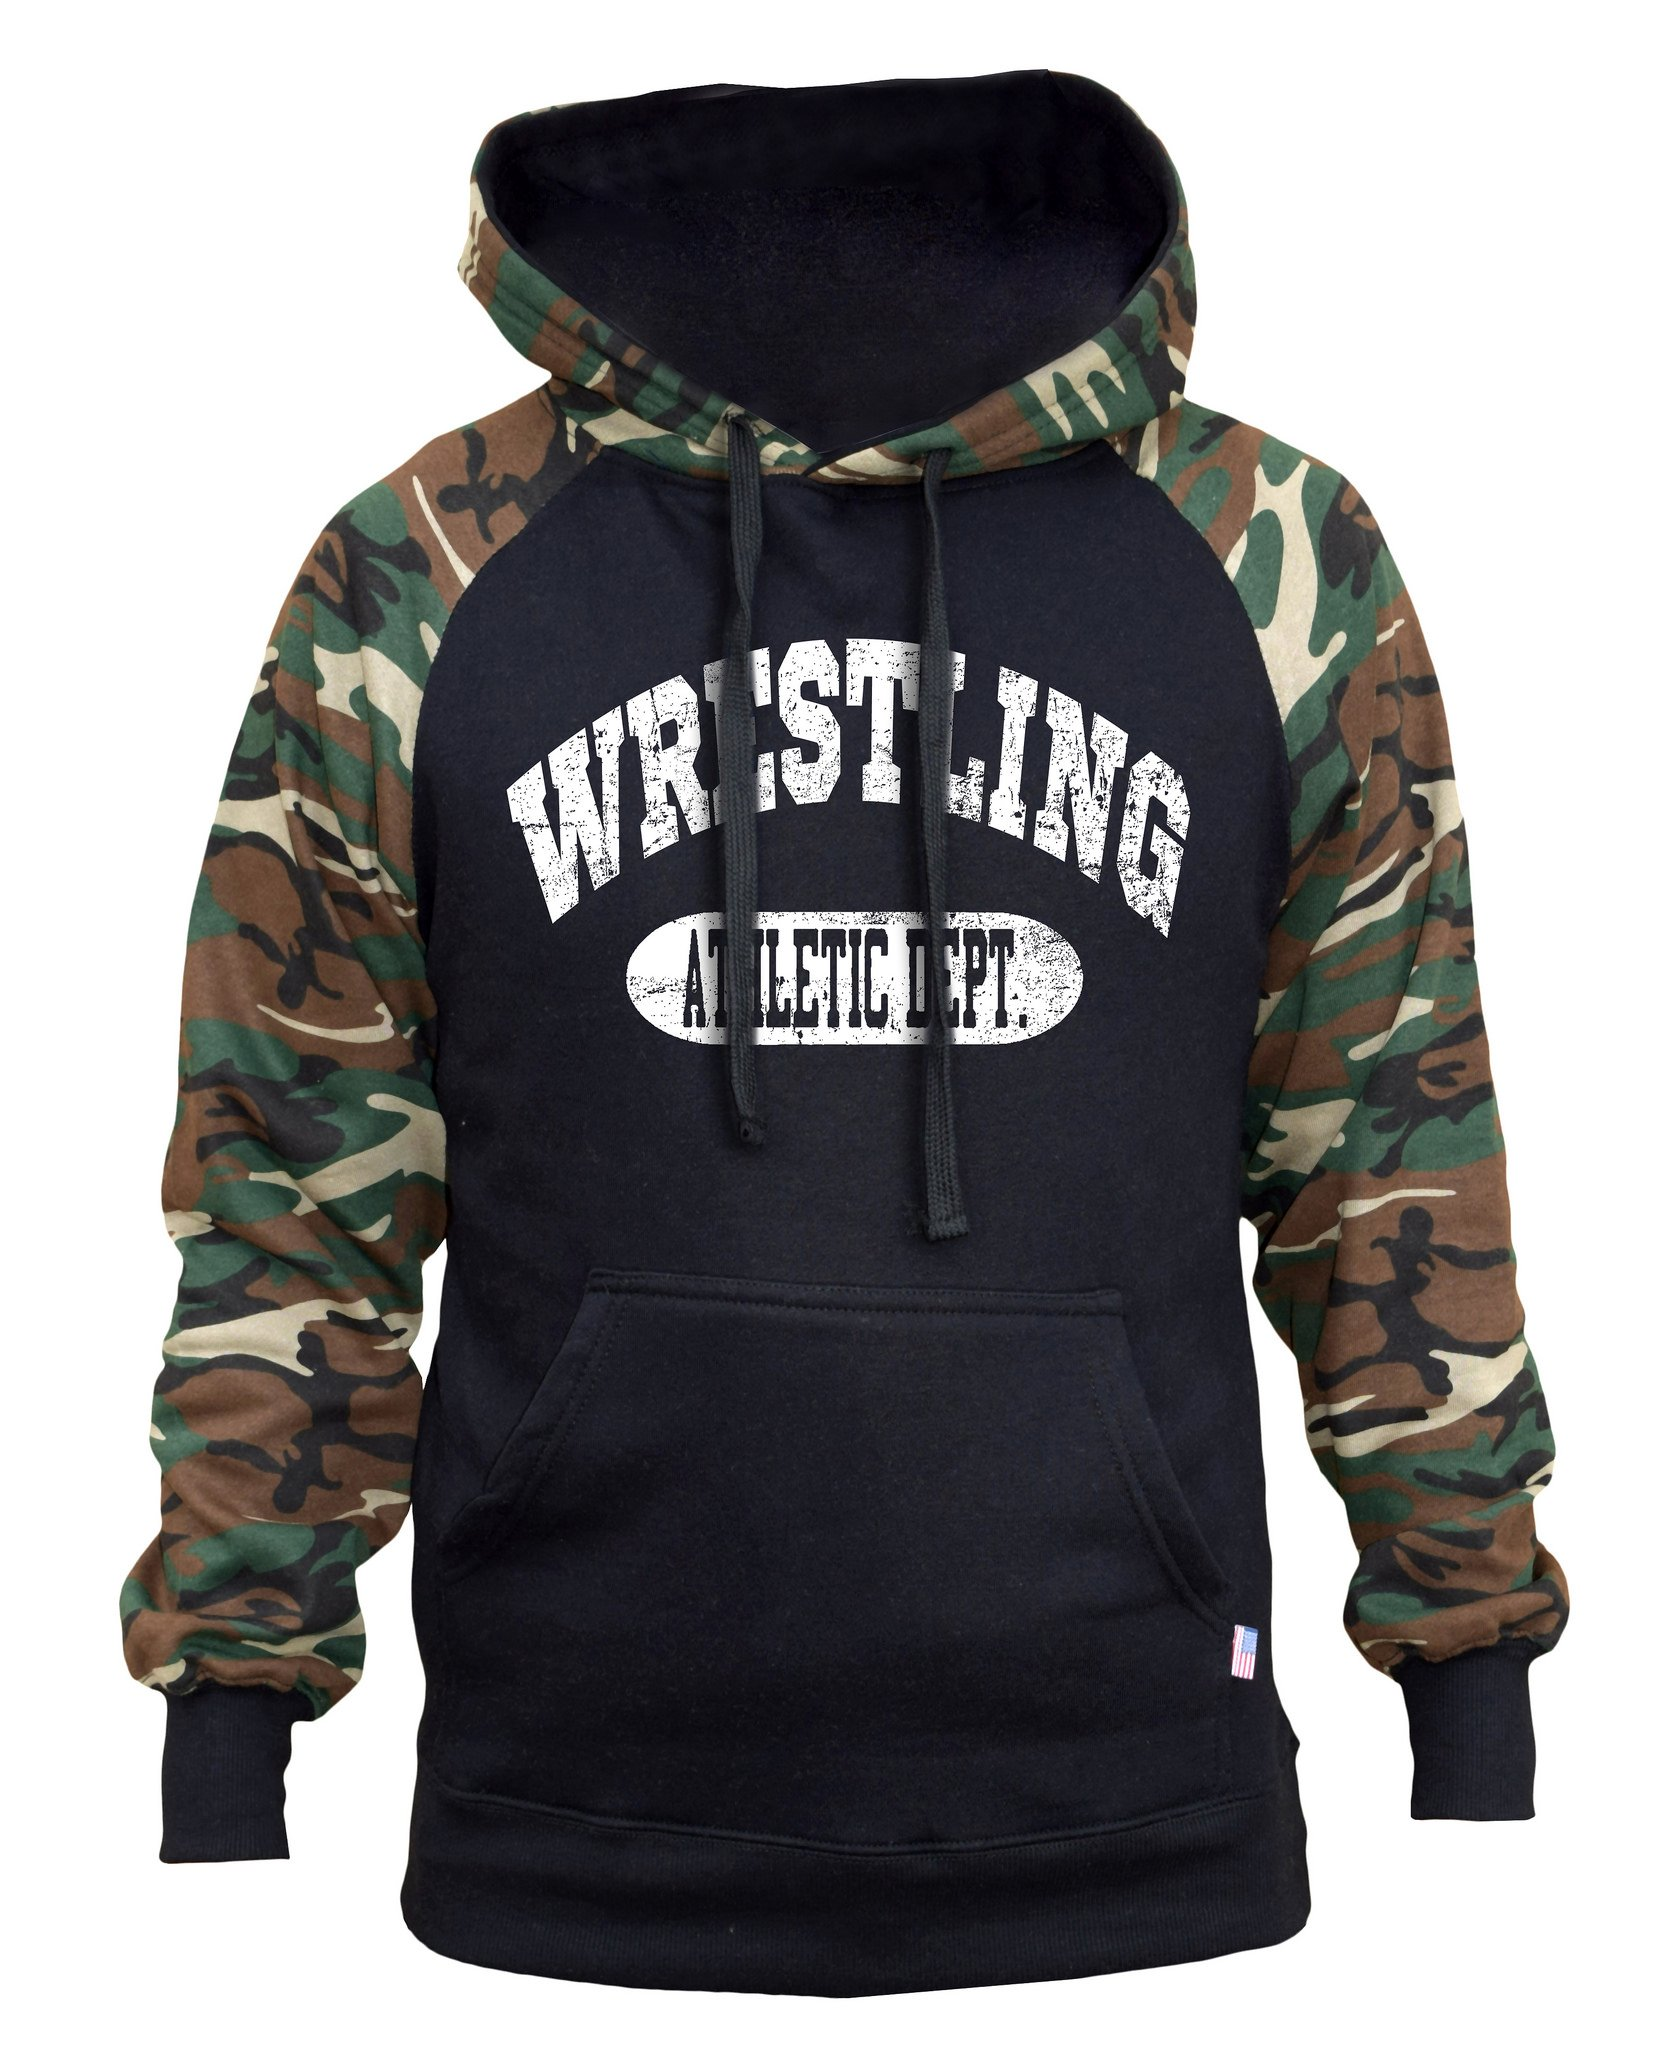 Interstate Apparel Men's Wrestling Athletic Dept. Black/Camo Raglan Baseball Hoodie Small Black